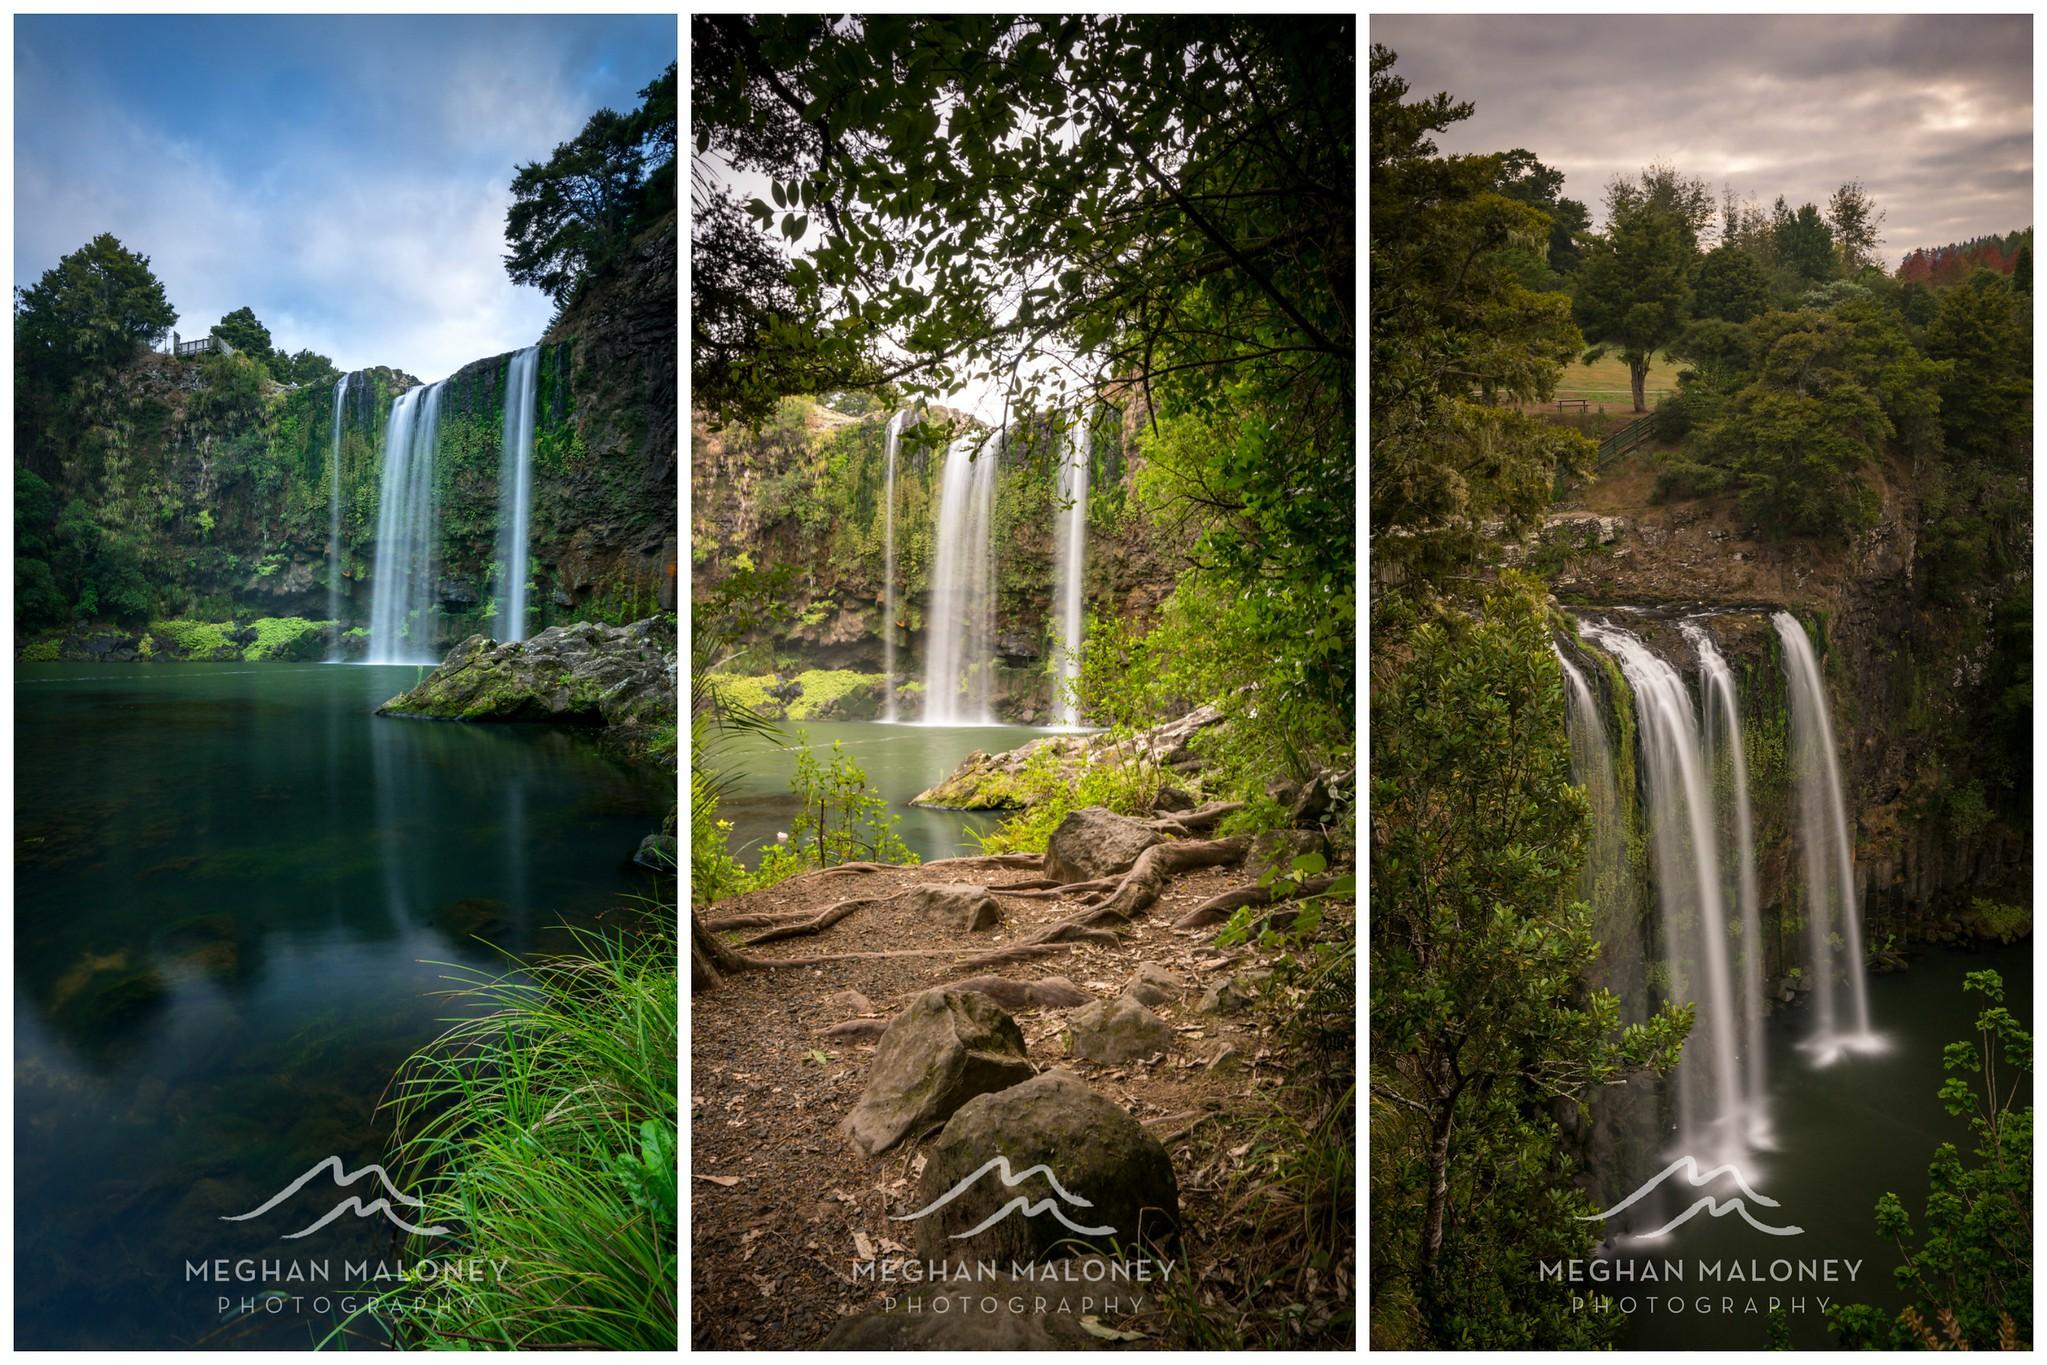 Whangarei-Falls-Northland